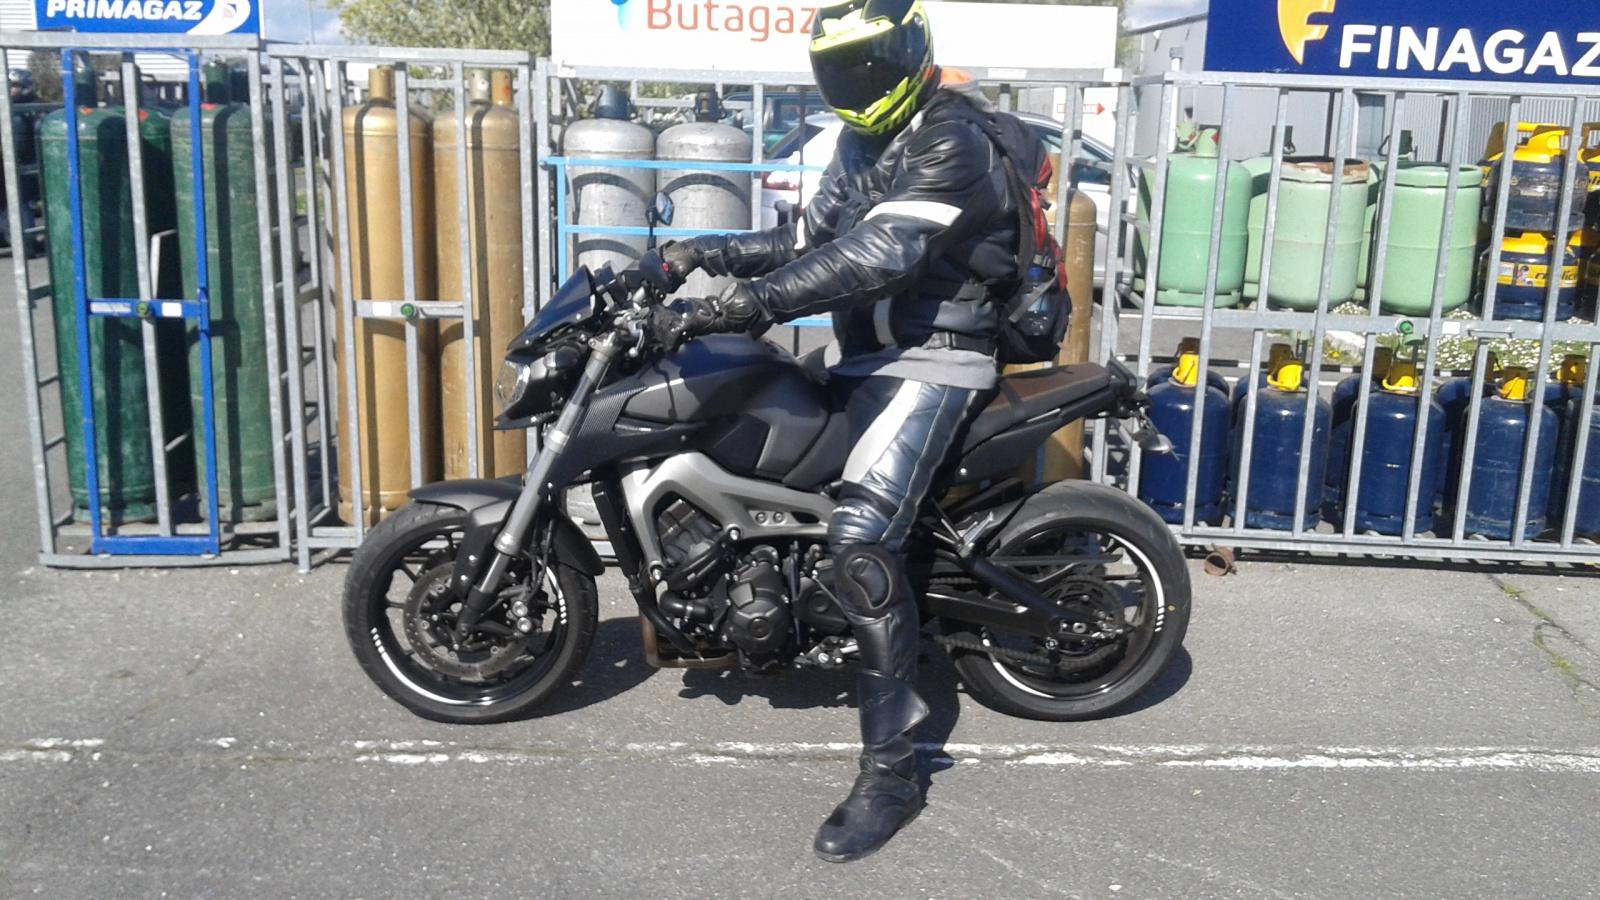 MT-09 Akrapovic Carbon grey/black street rally - Page 3 18046120160417111432